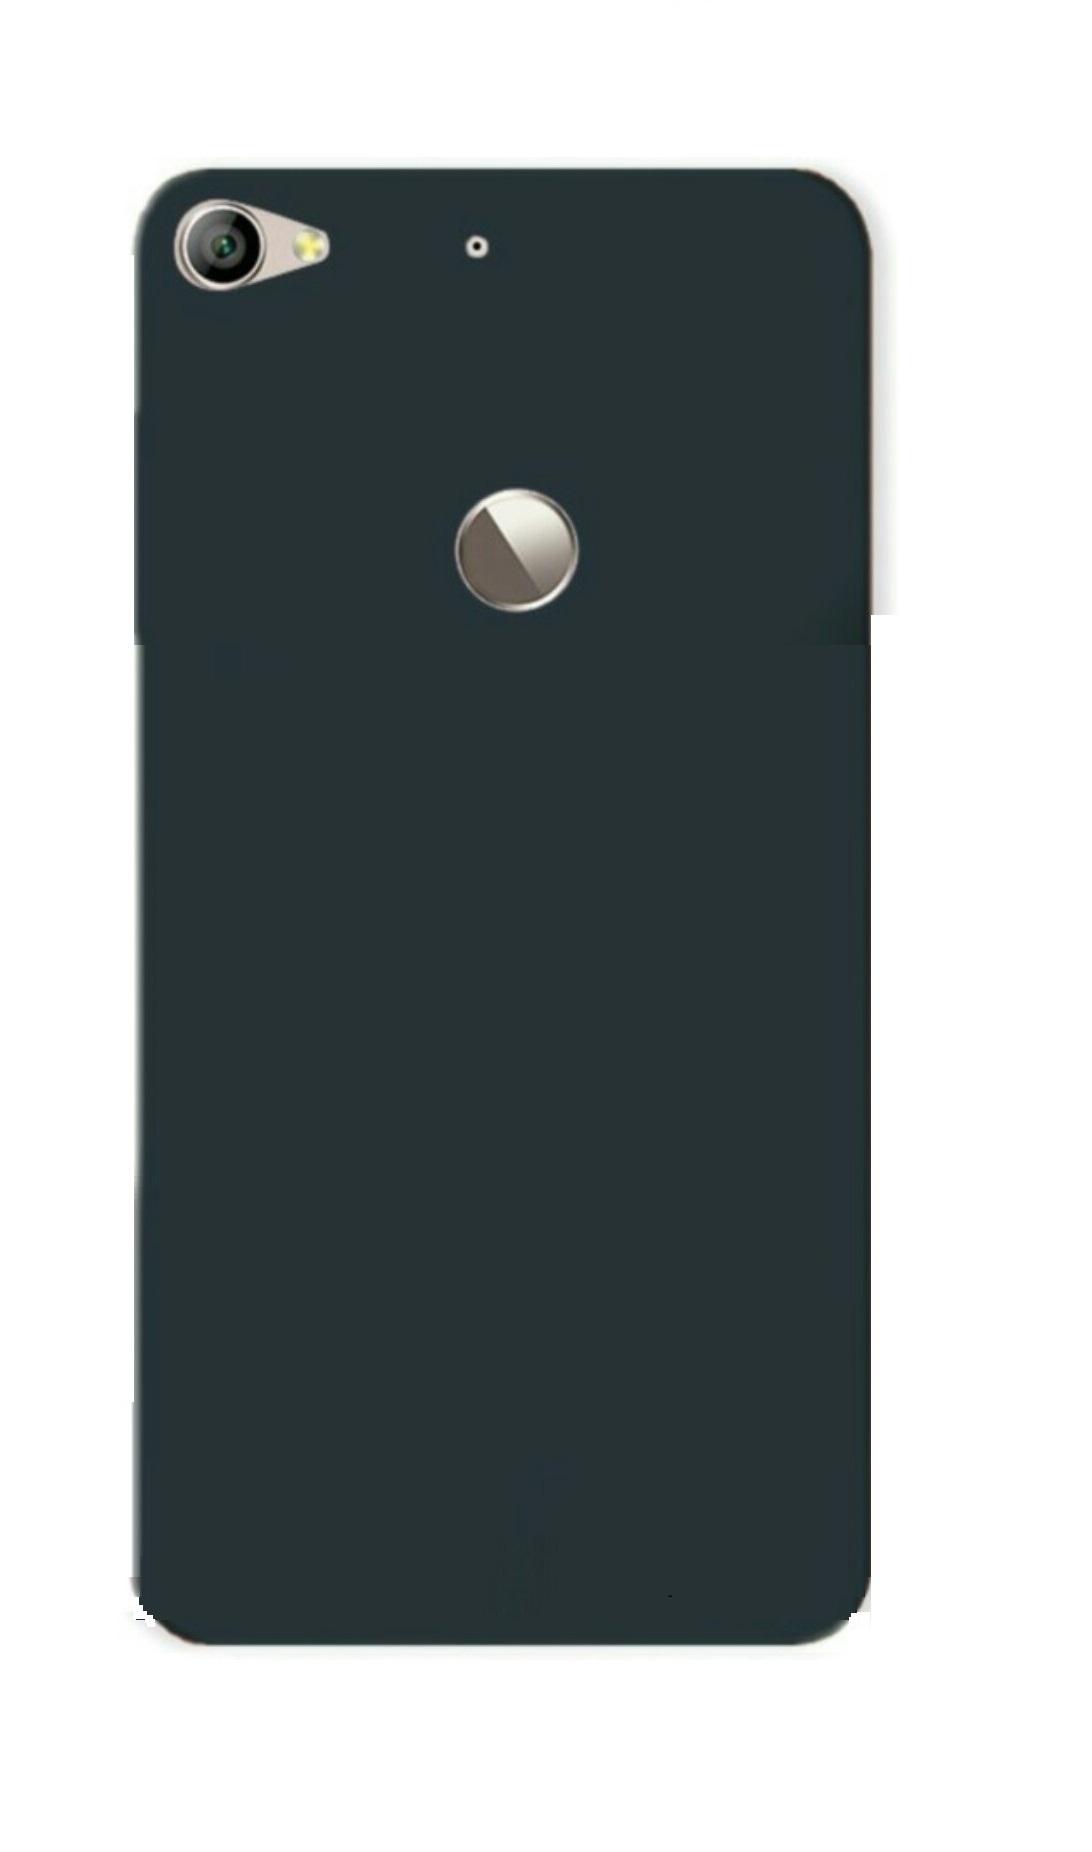 LeEco LeTv Le 1s Back Cover Case Black By mascot max